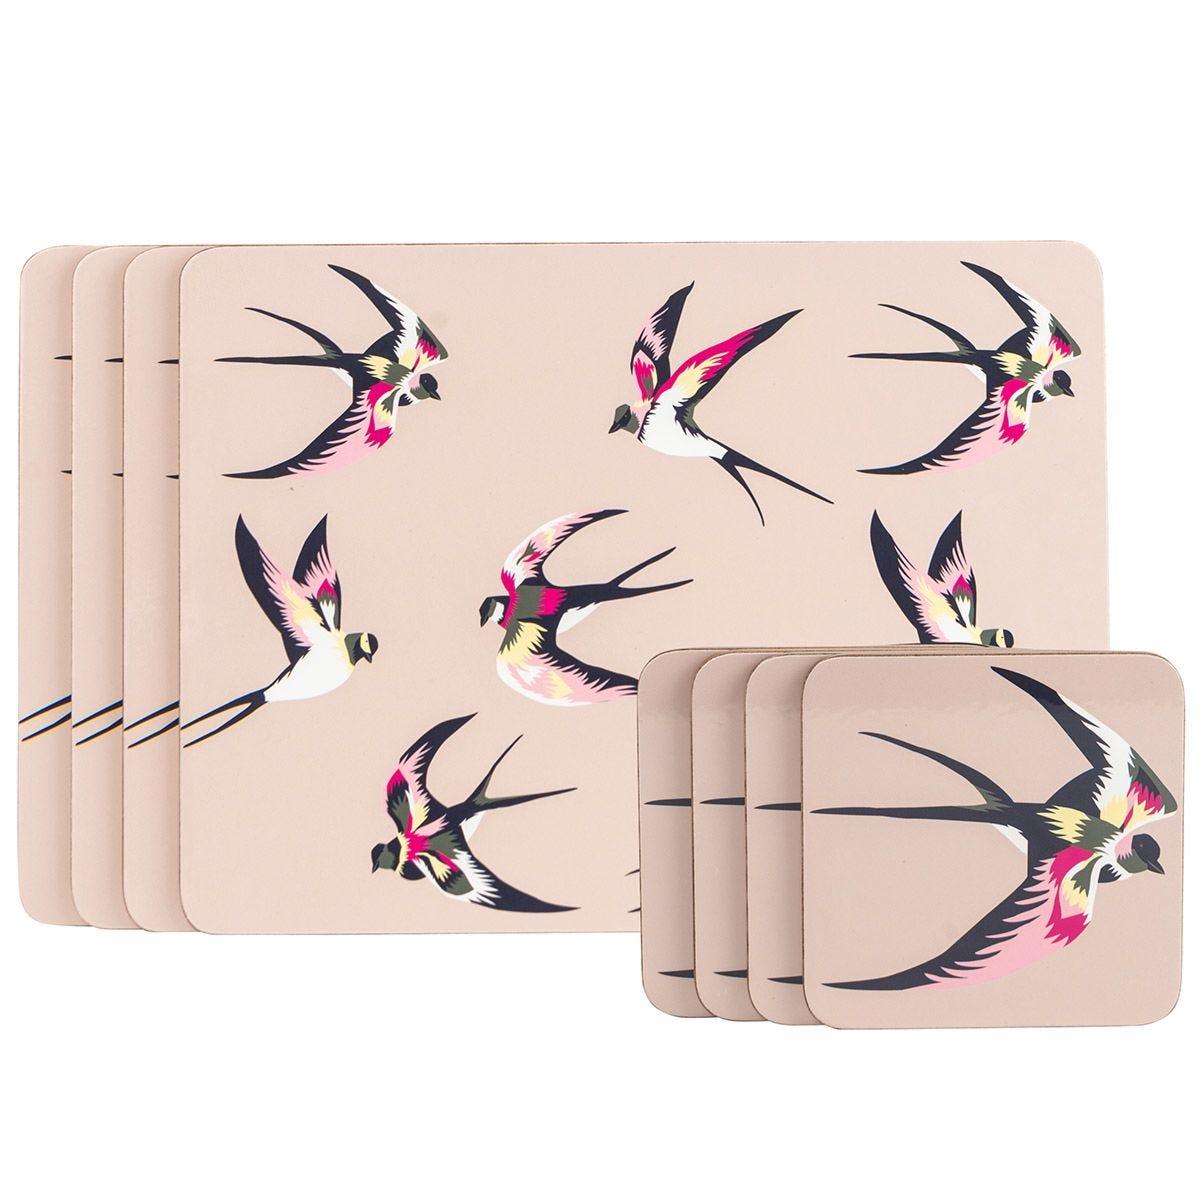 Summerhouse Guatemala Swallow Set of 4 Coasters & 4 Placemats